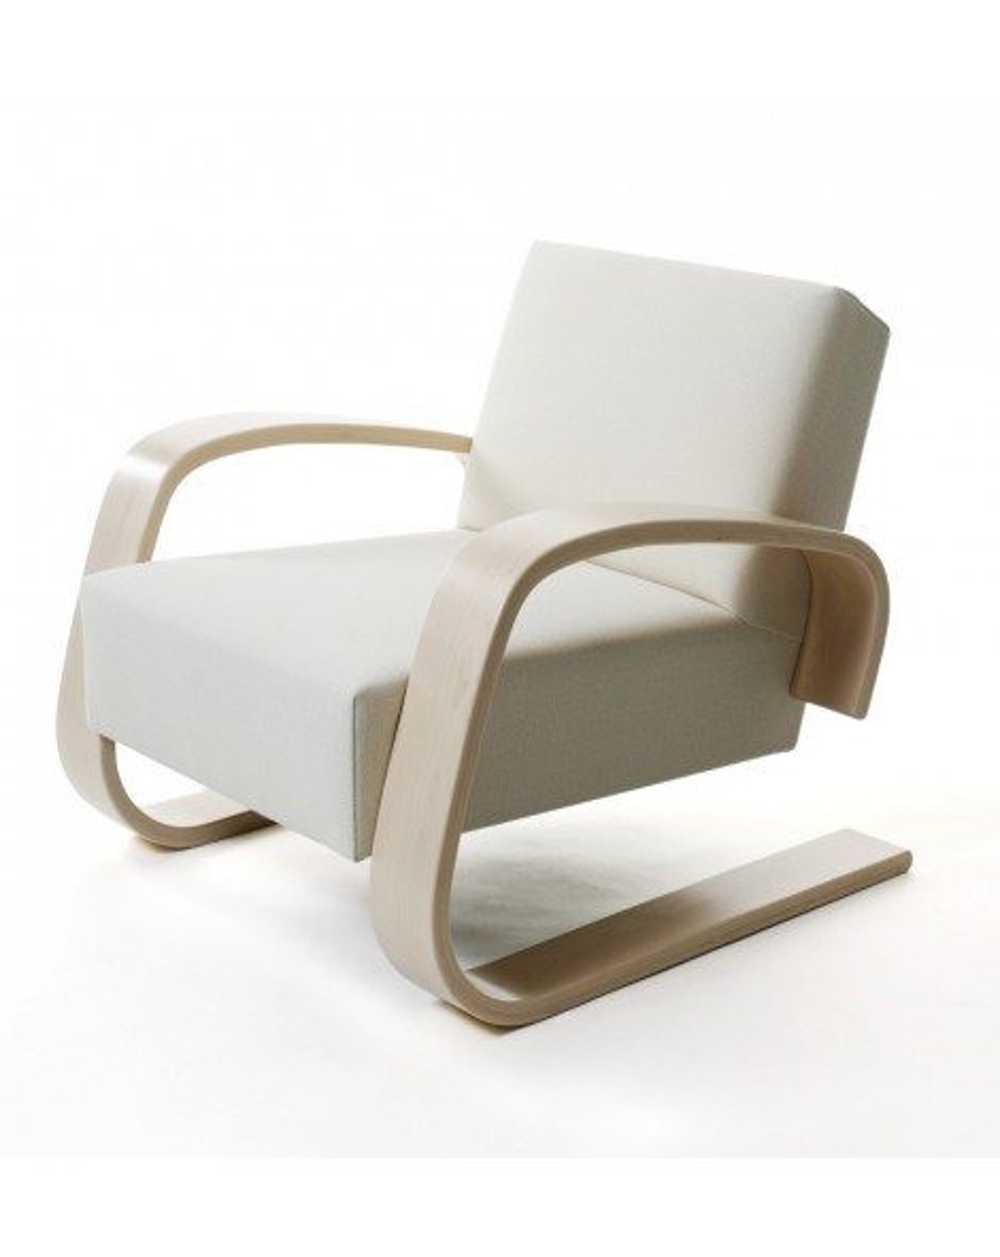 Armchair 400 Designer Alvar Aalto for Artek